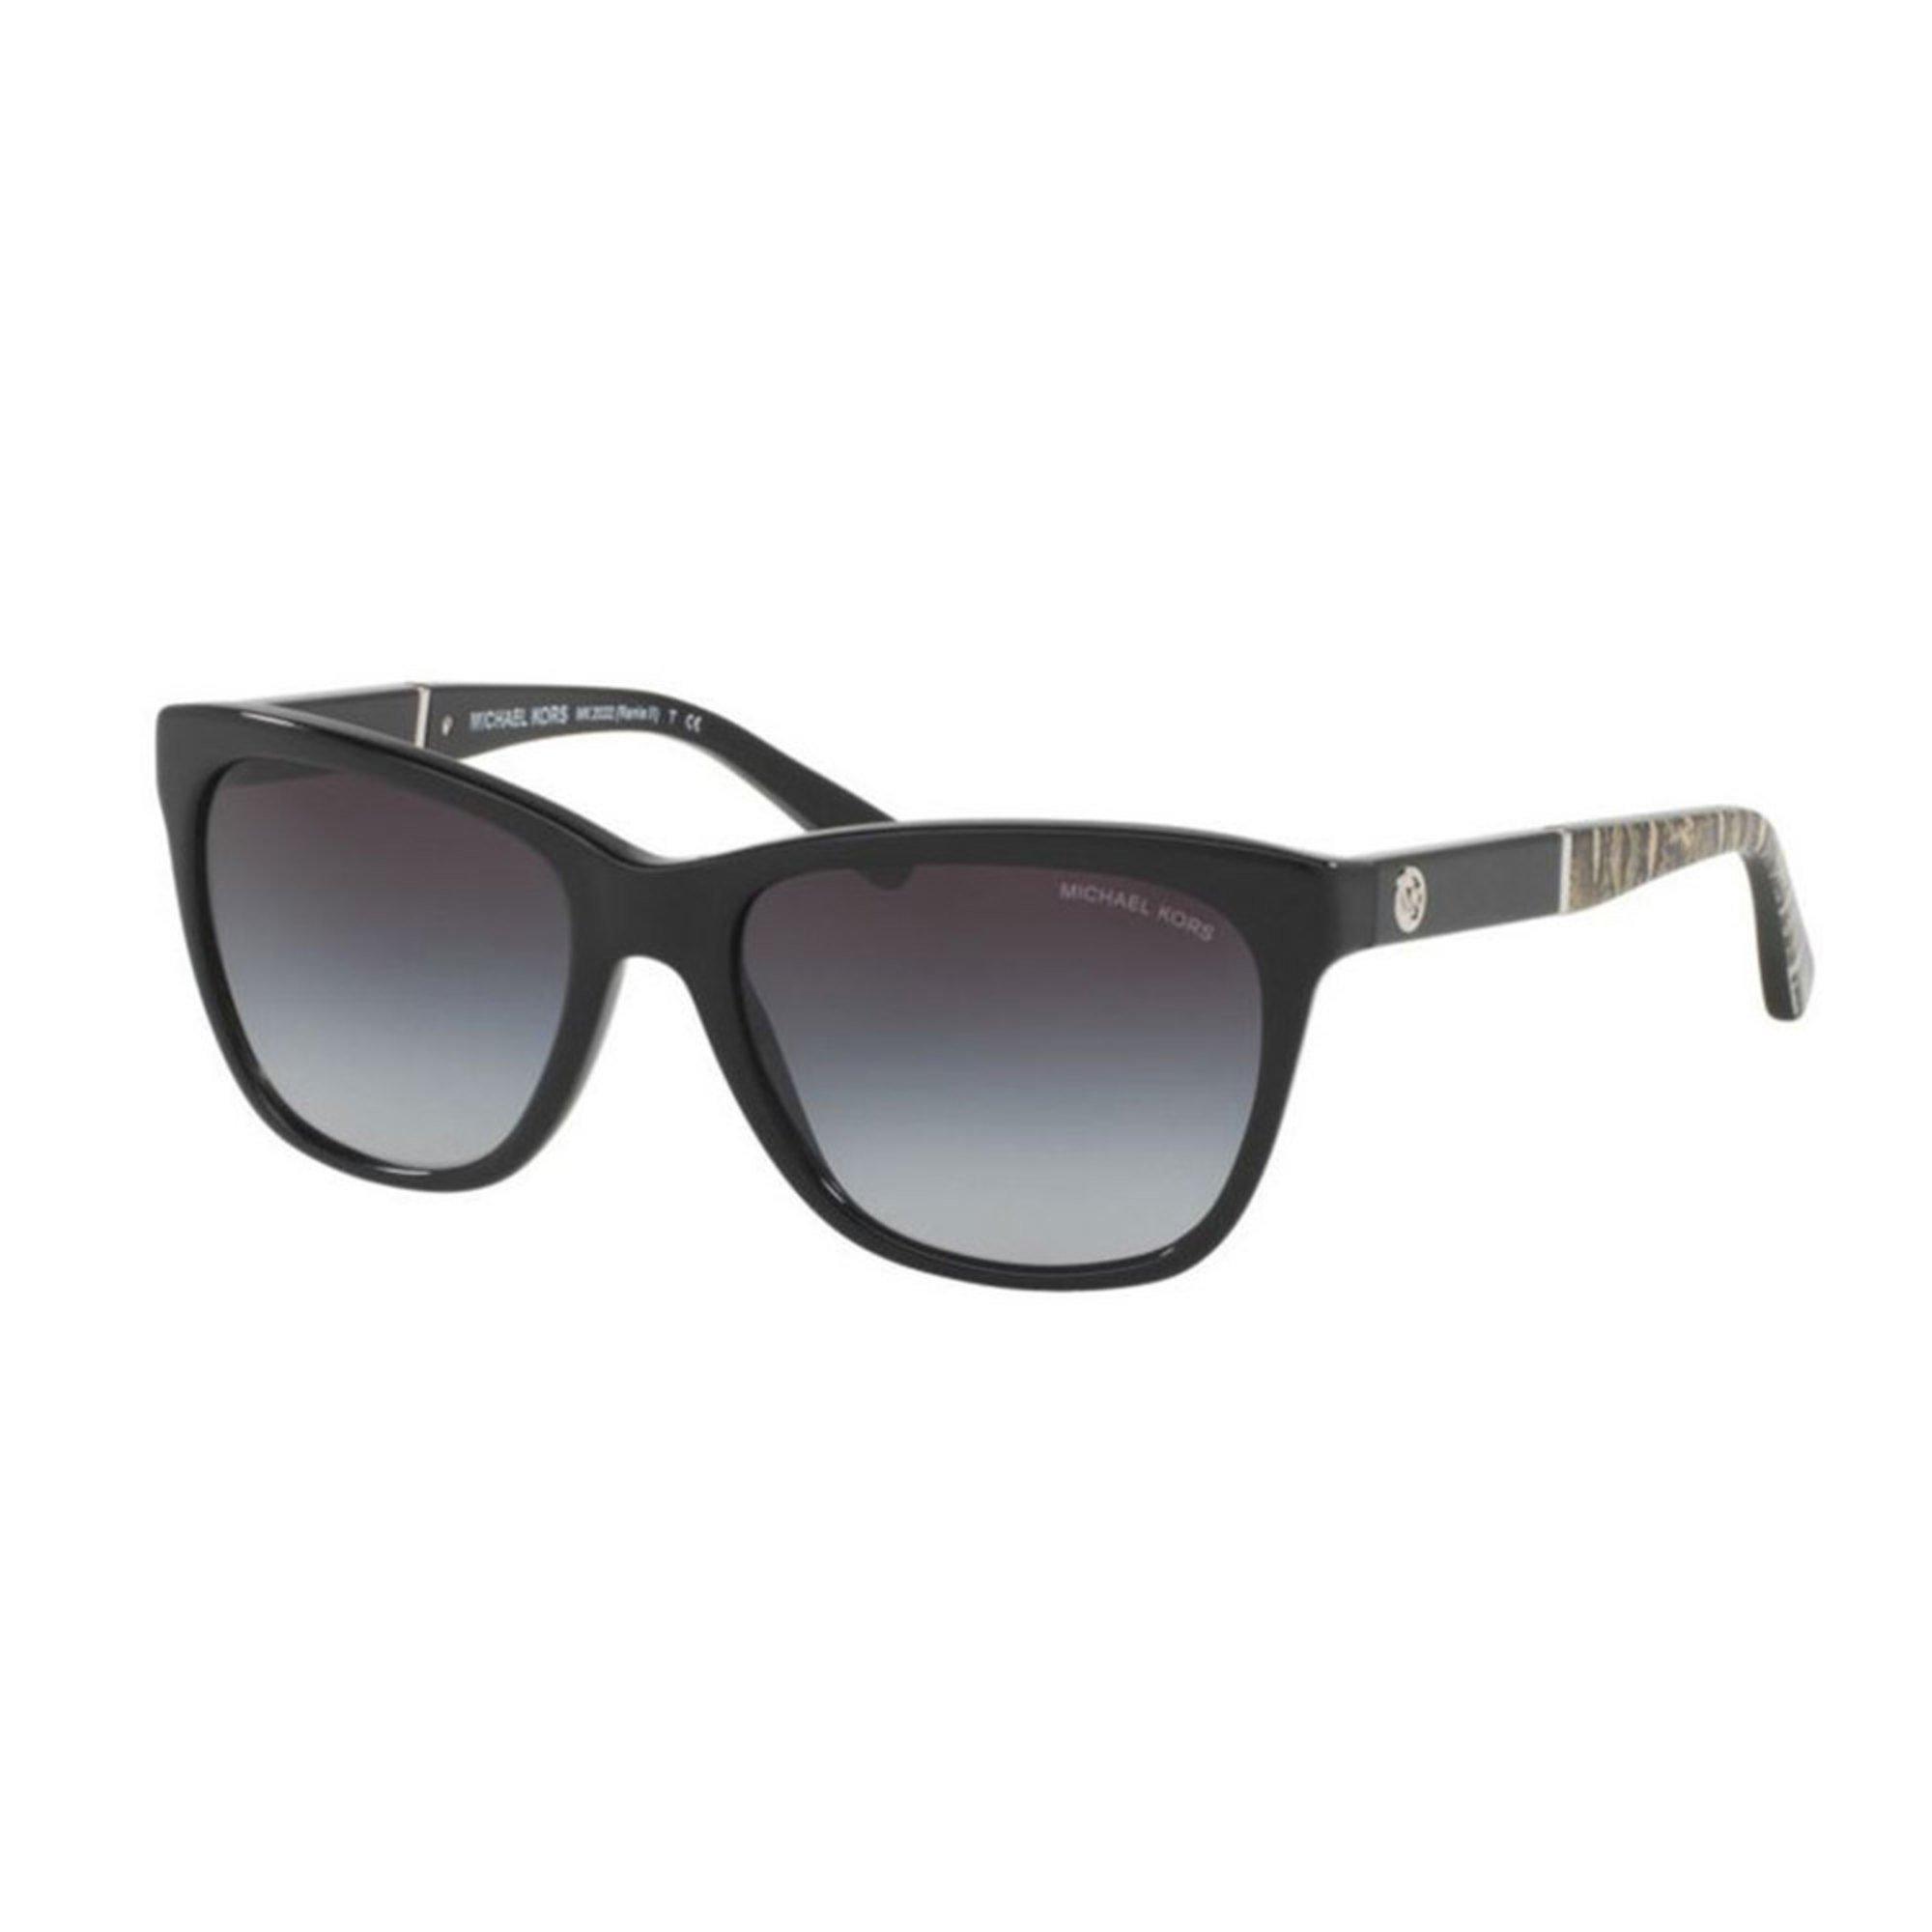 54mm sunglasses dnid  54mm sunglasses